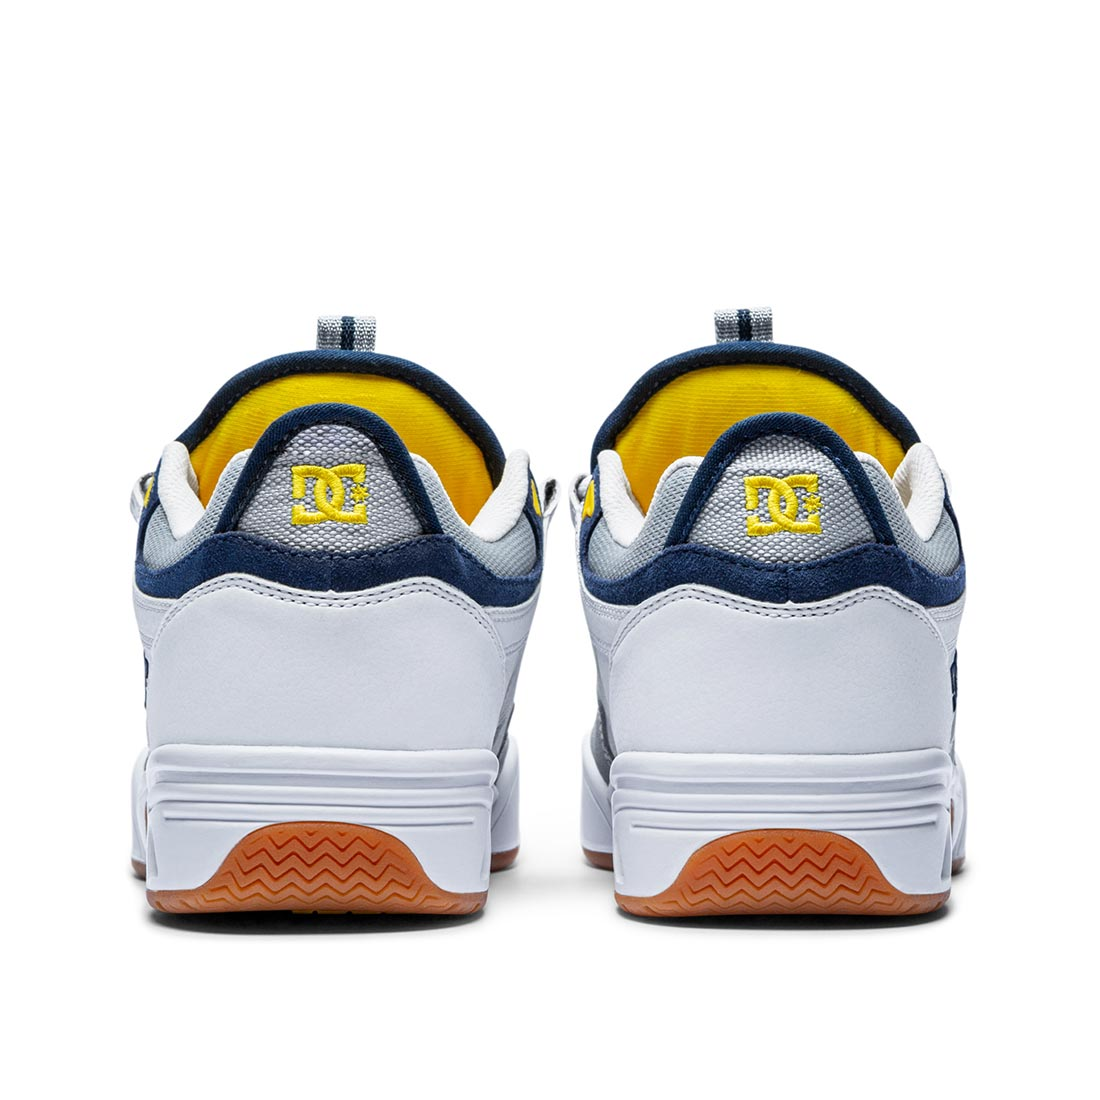 DC Shoes Kalis OG White Grey